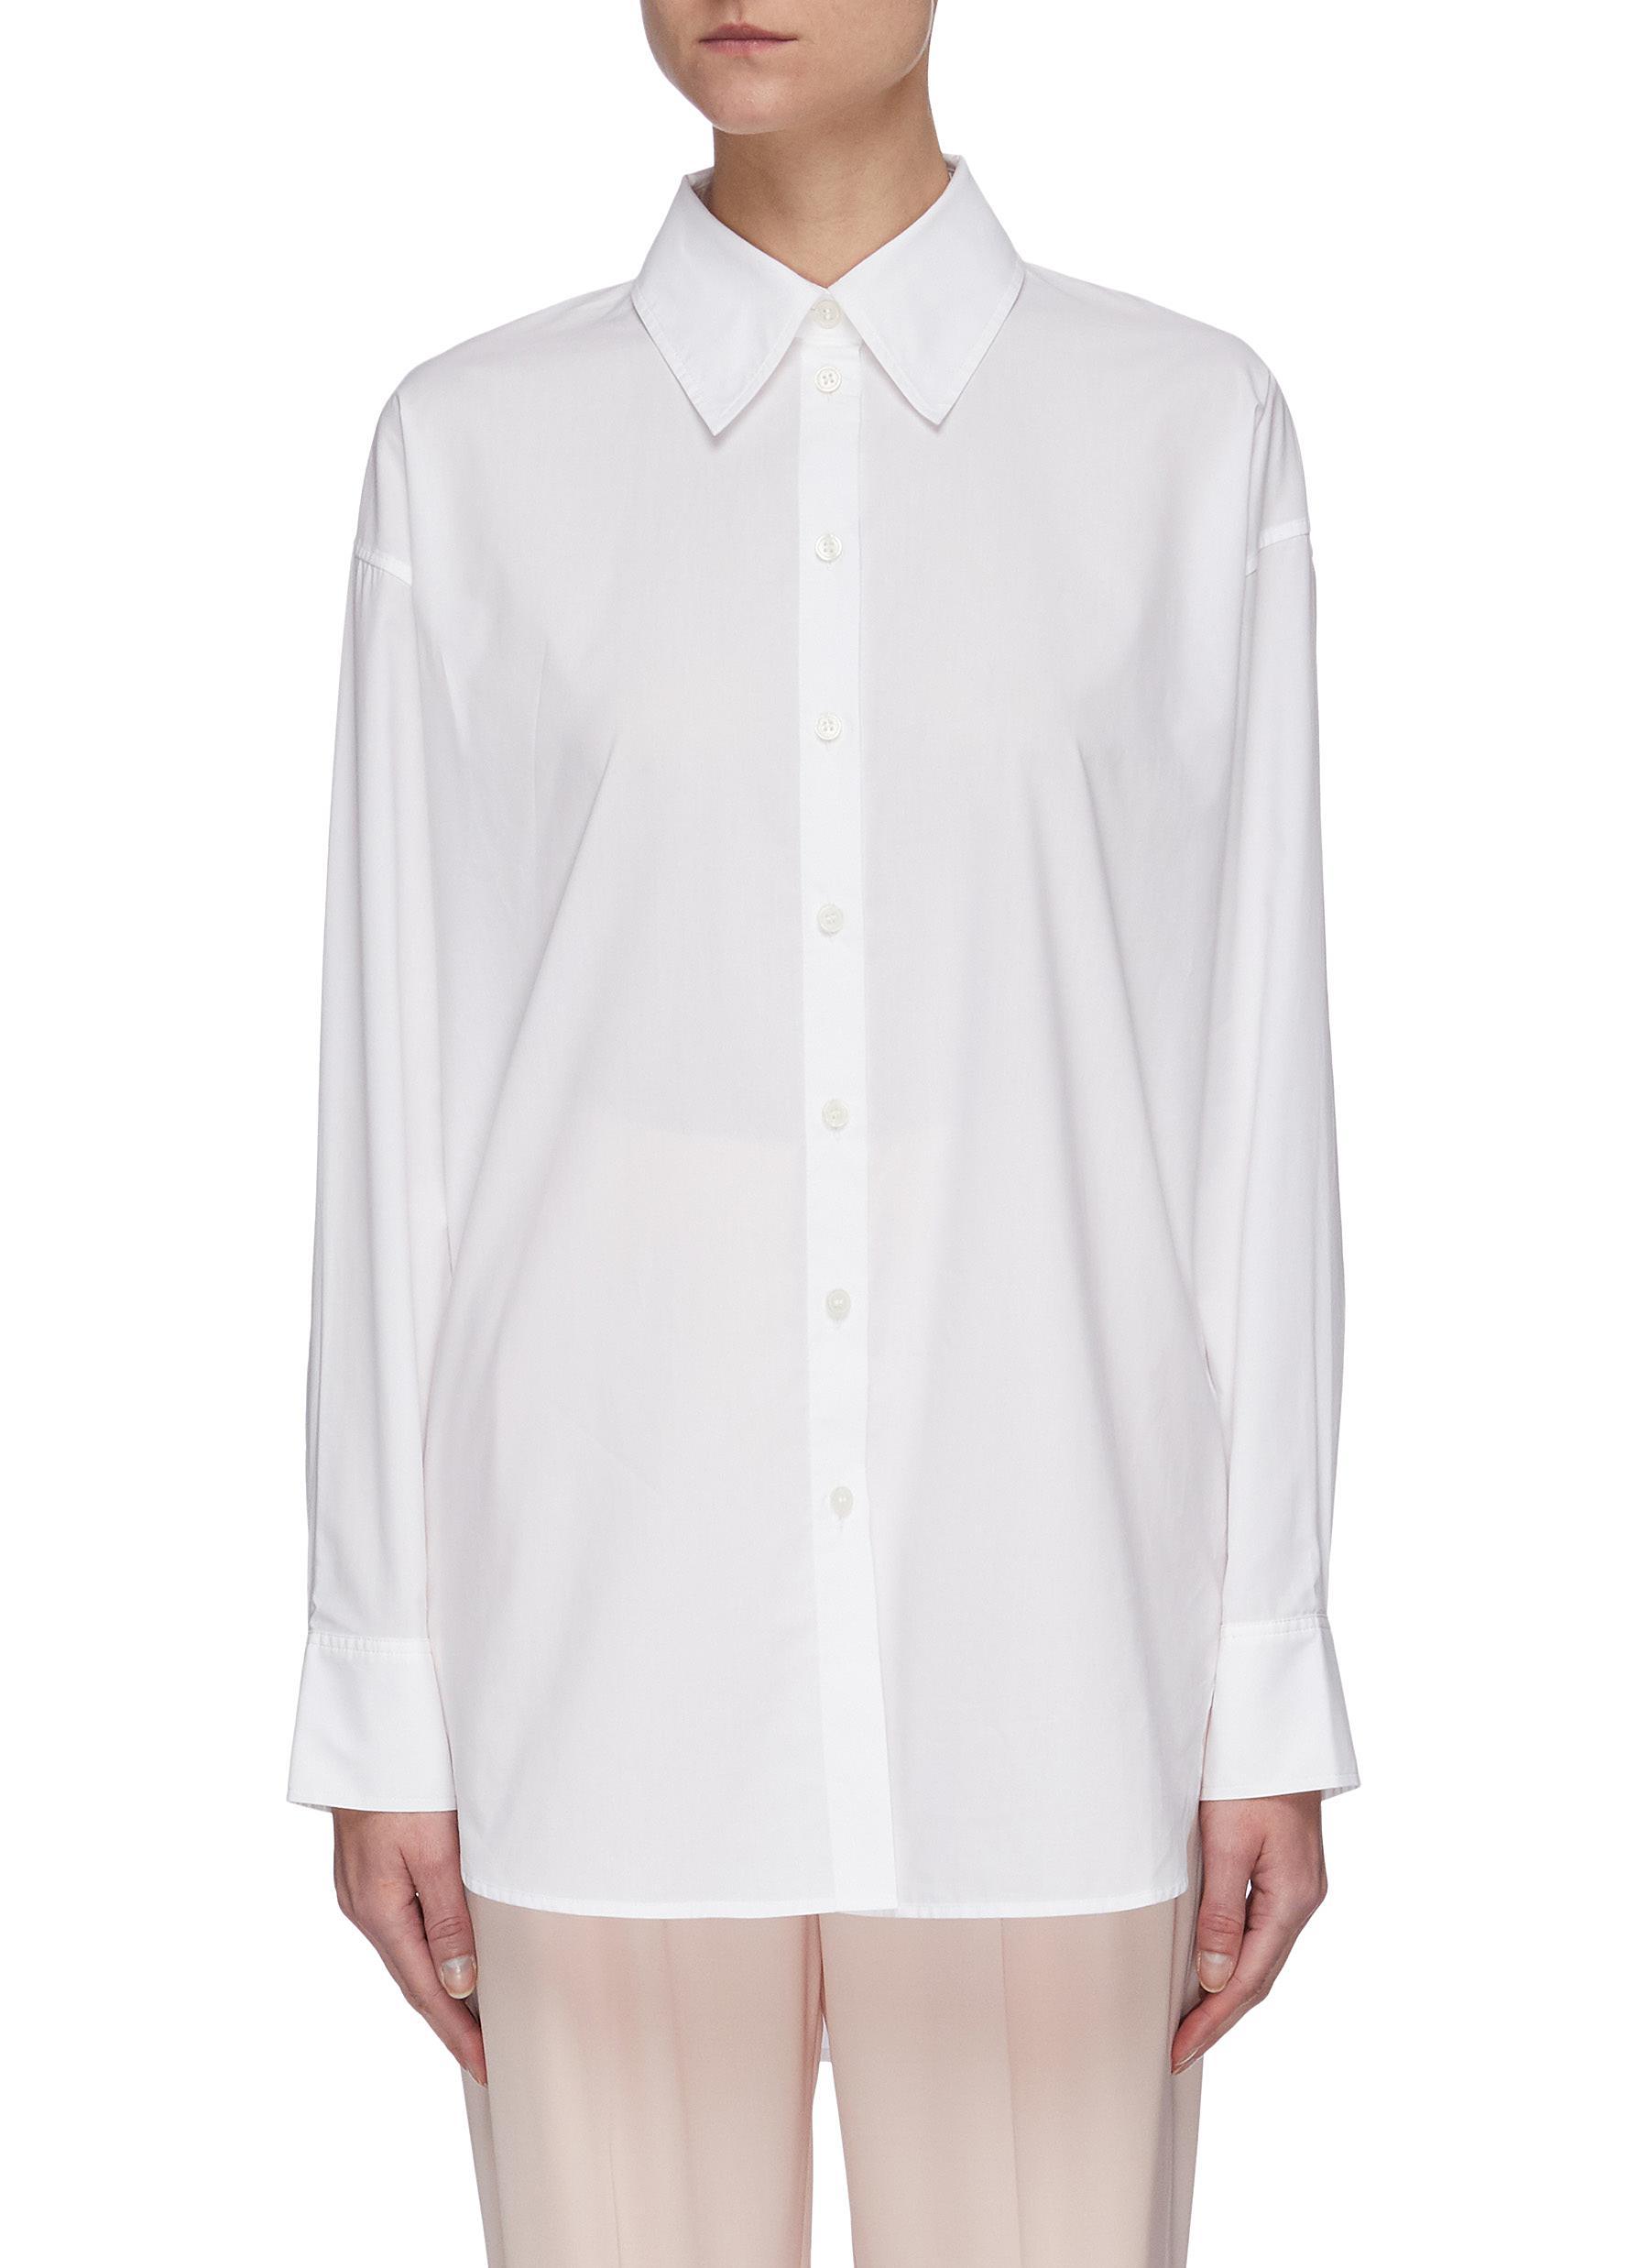 Buy Acne Studios Tops Cotton poplin shirt